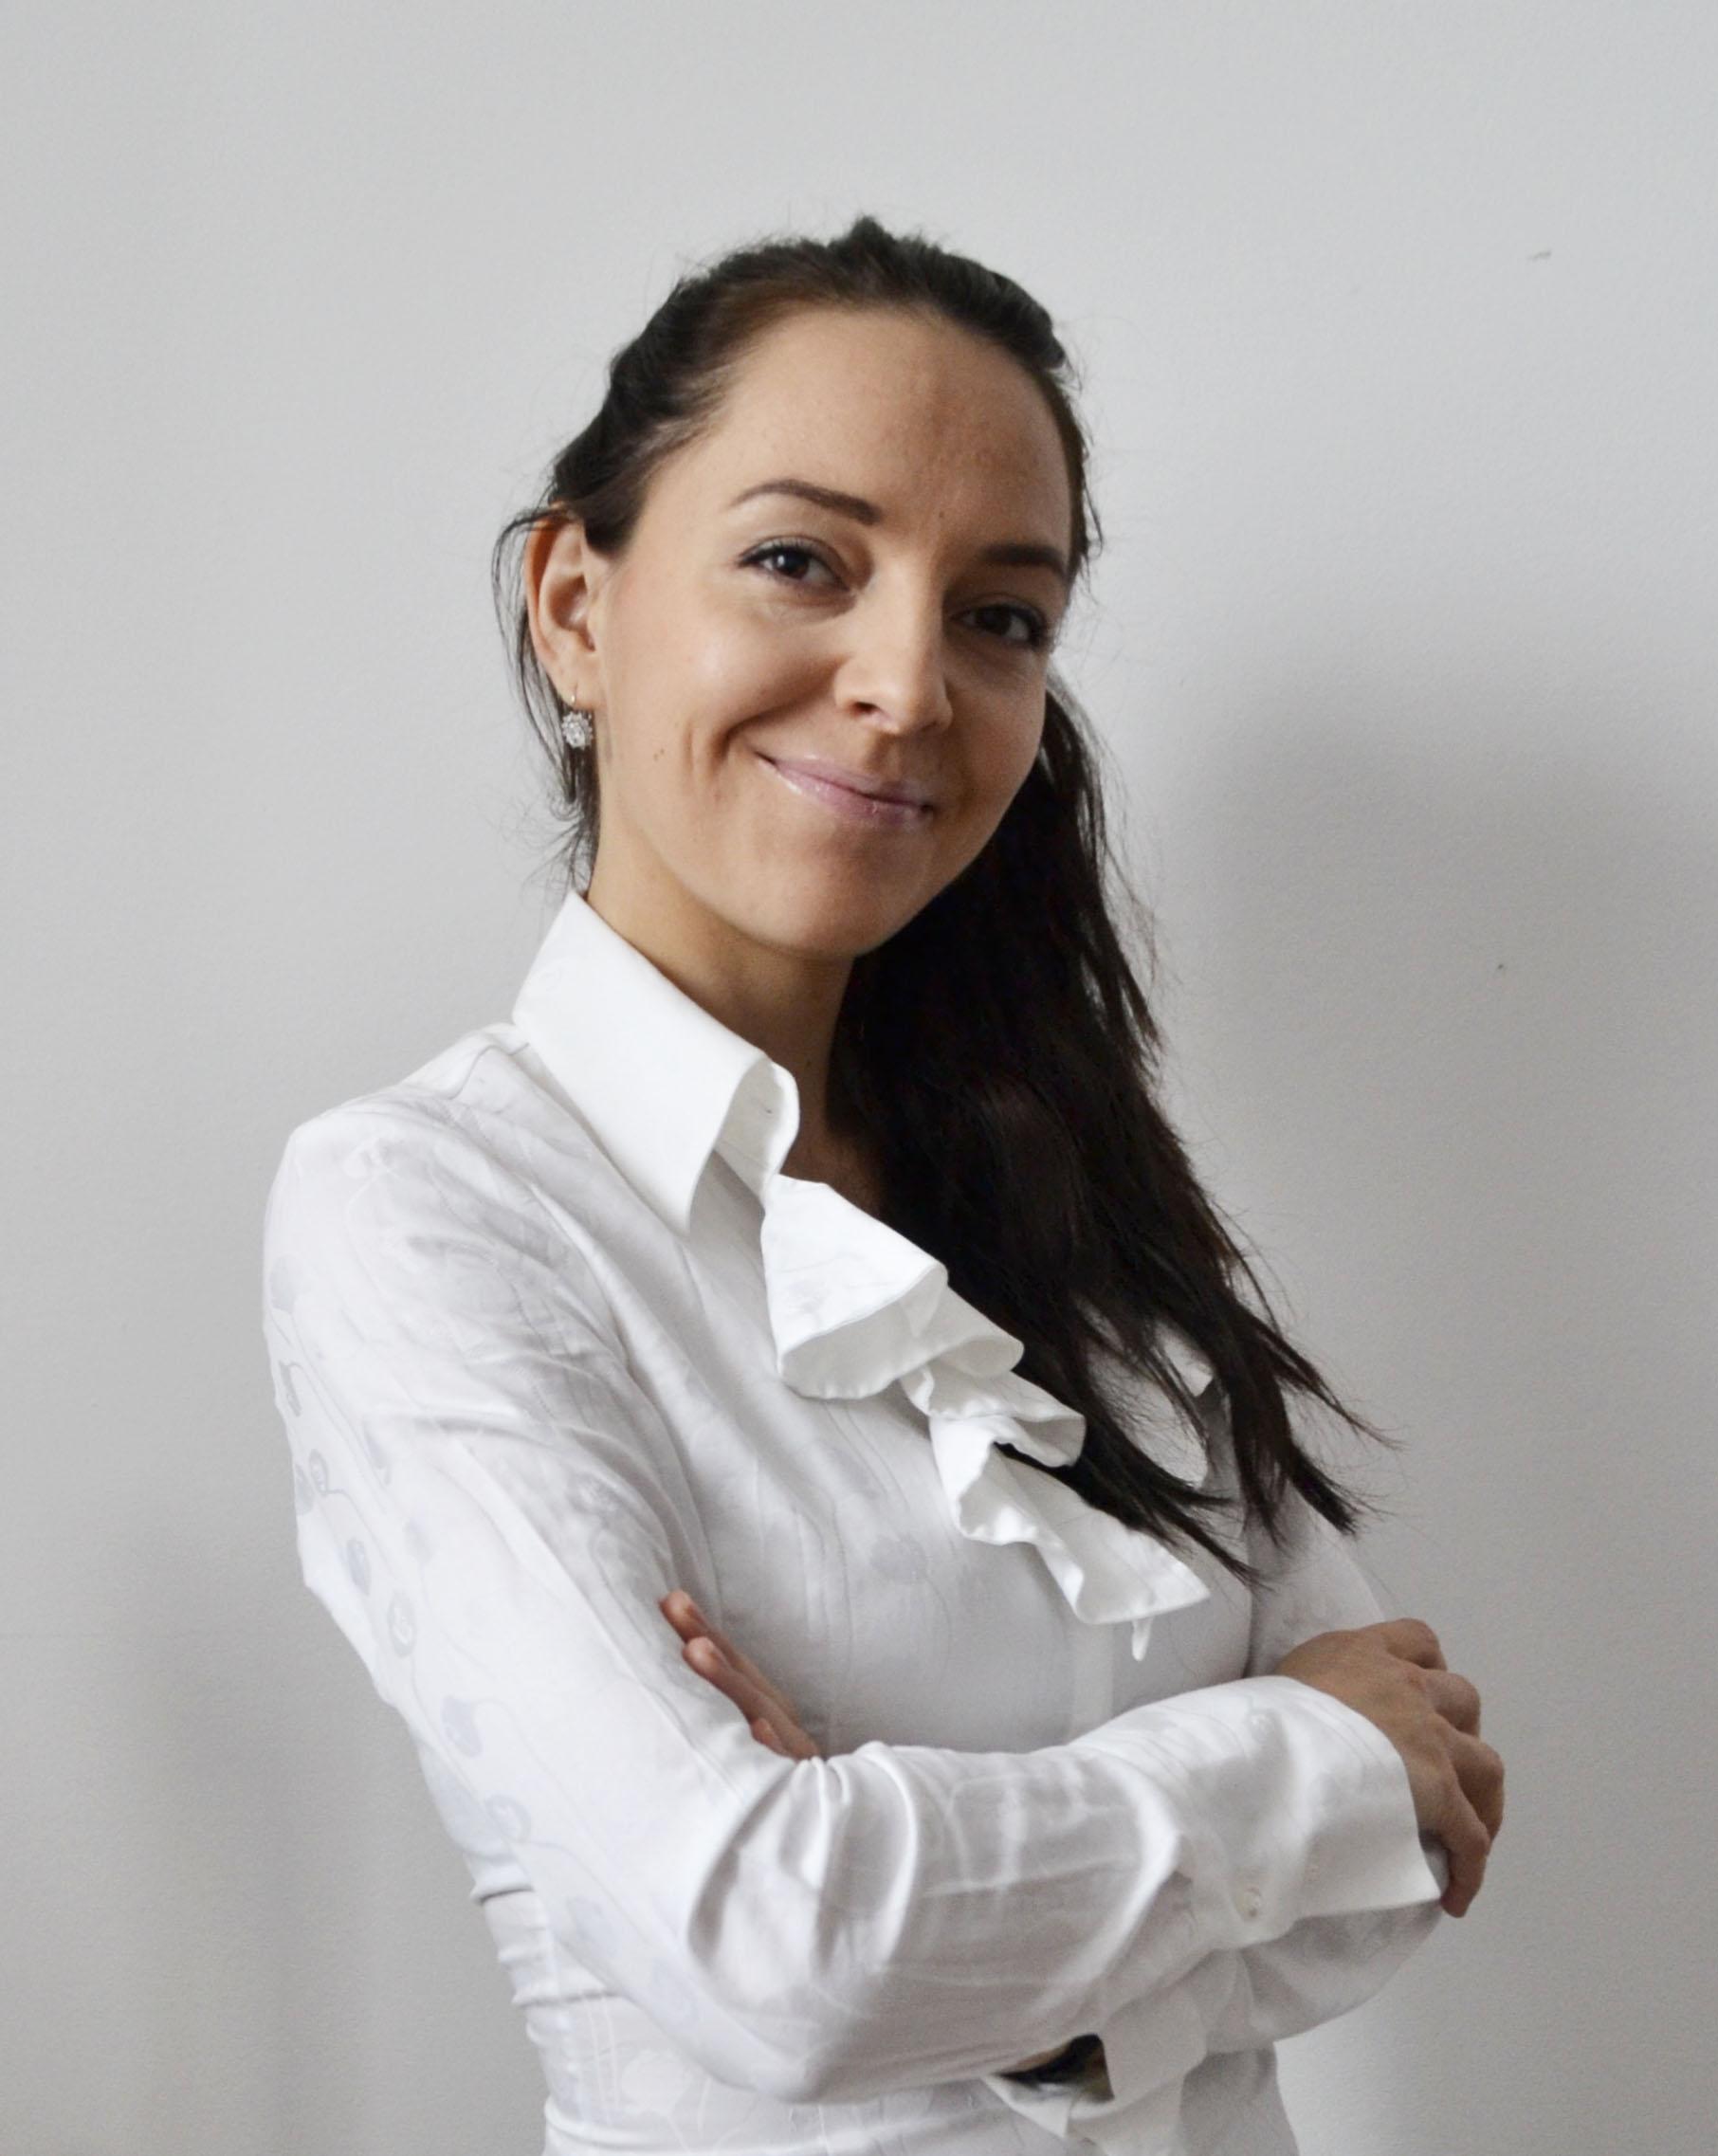 Mgr. Lucia Šafár, BCTC